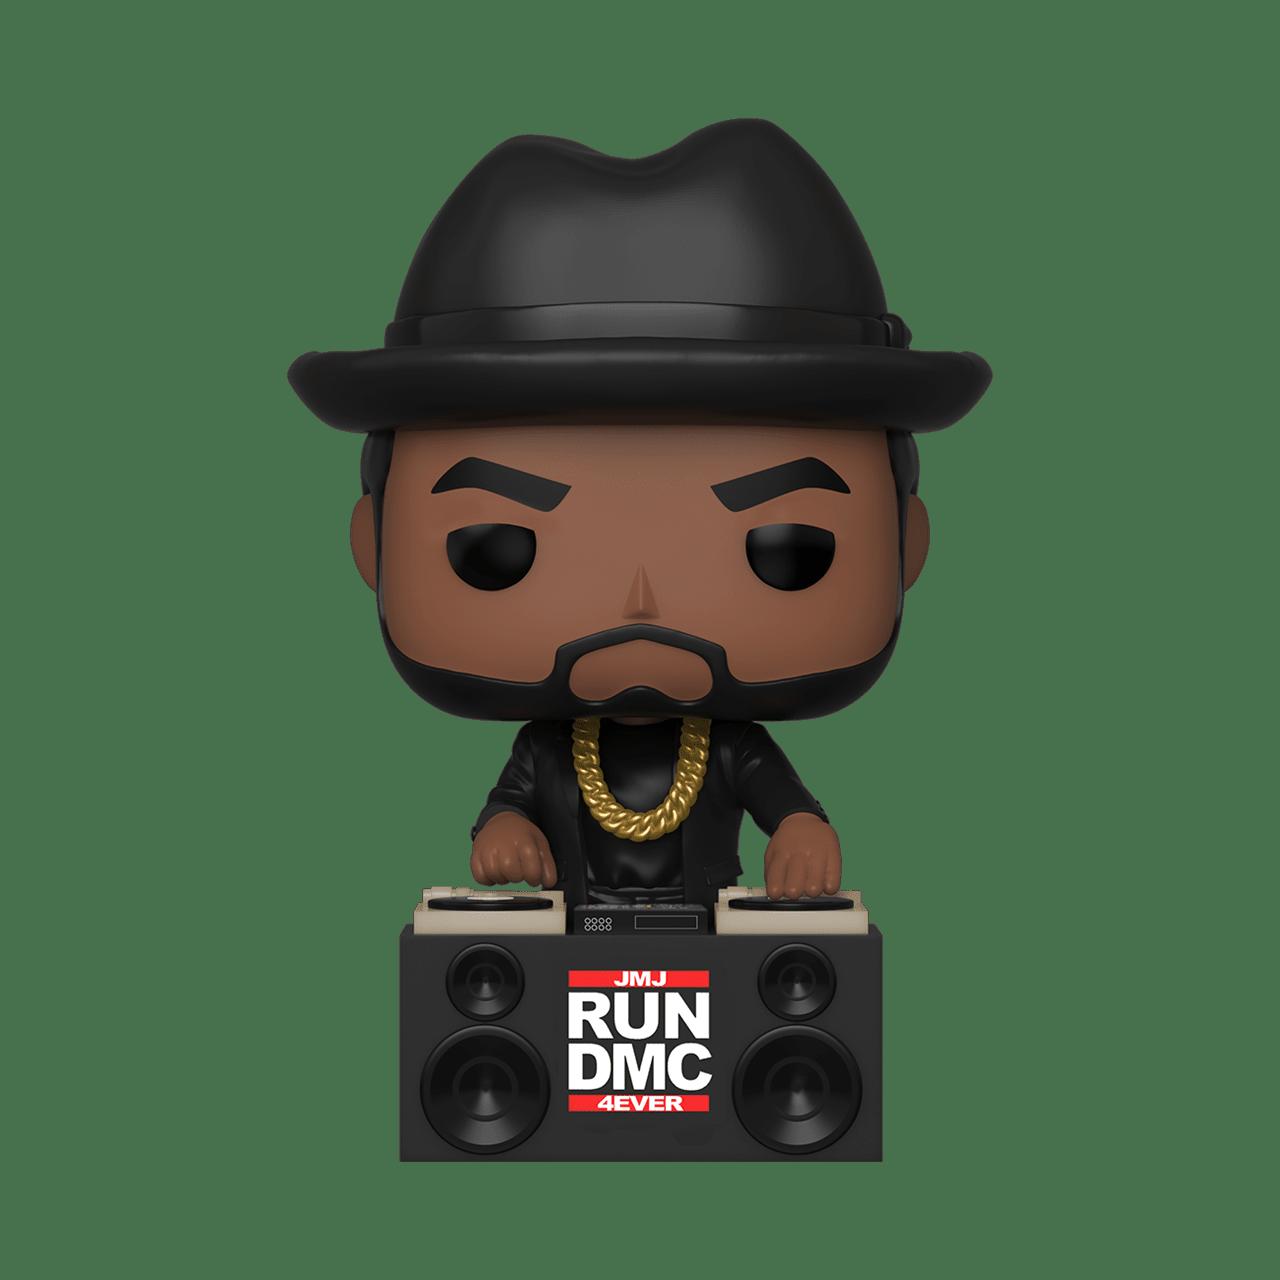 Jam Master Jay (201) Run DMC Pop Vinyl - 1